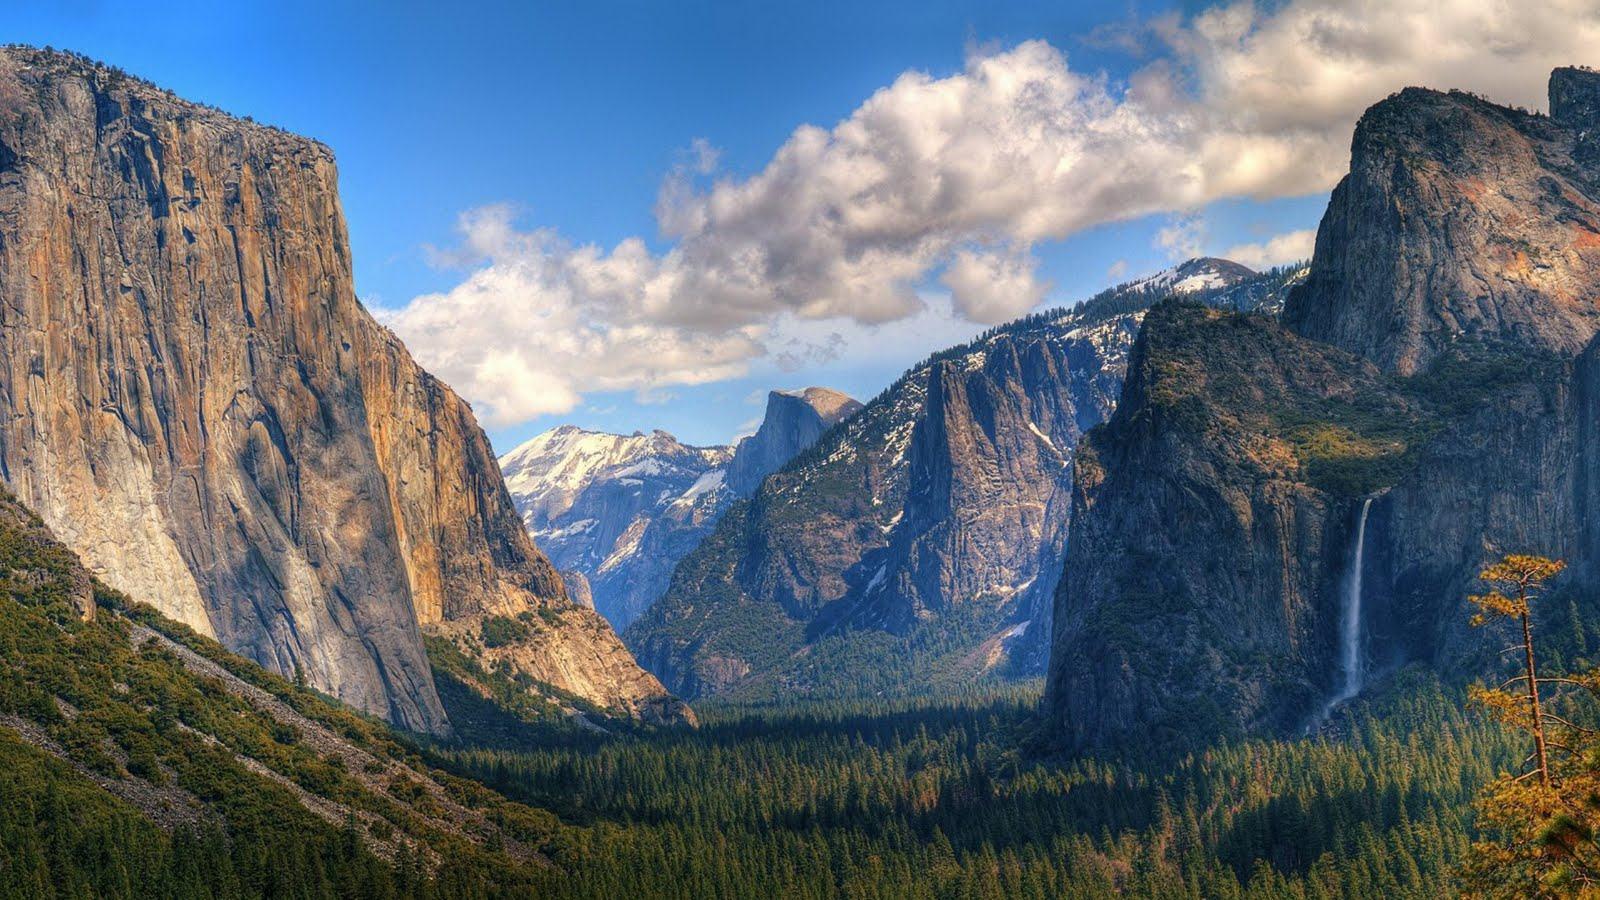 Backgrounds   Yosemite valley USA download wallpapers HD desktop 1600x900